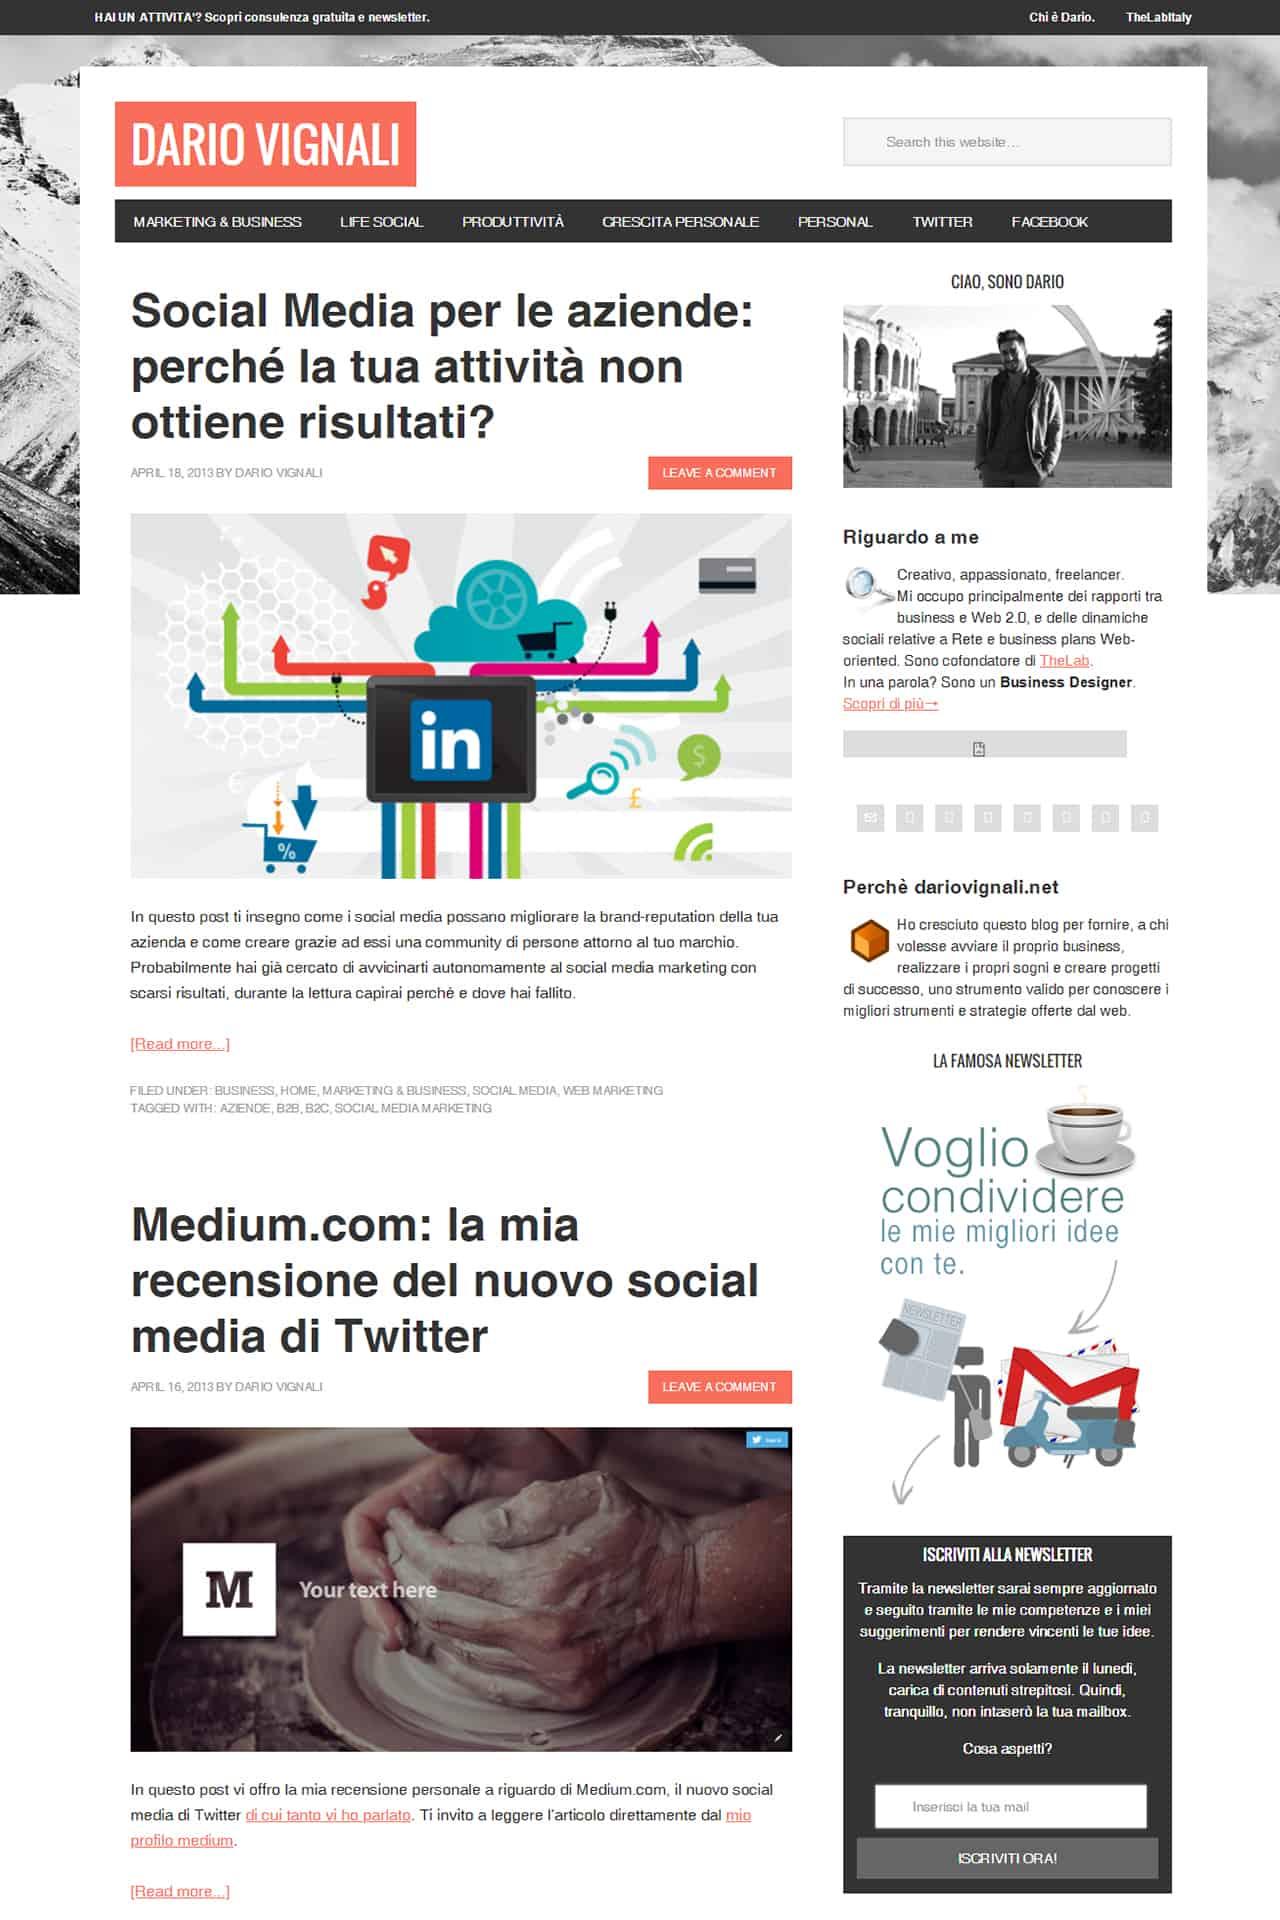 dariovignali.net